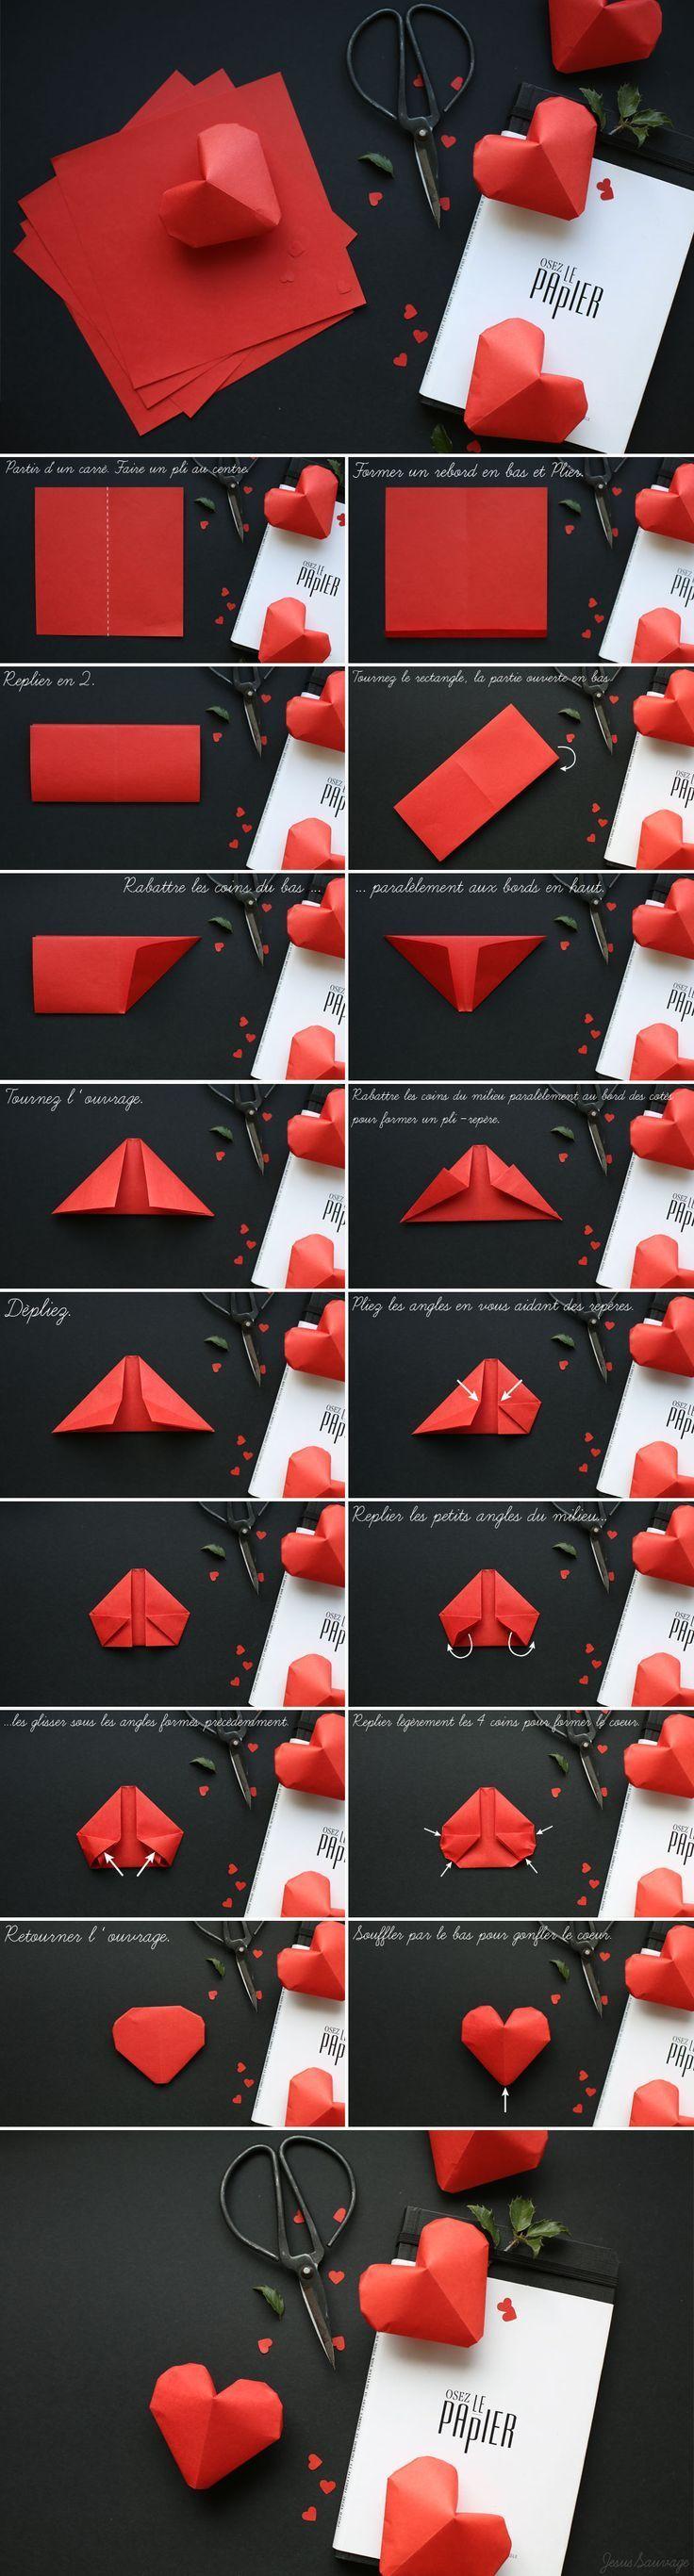 DIY Paper Hearts